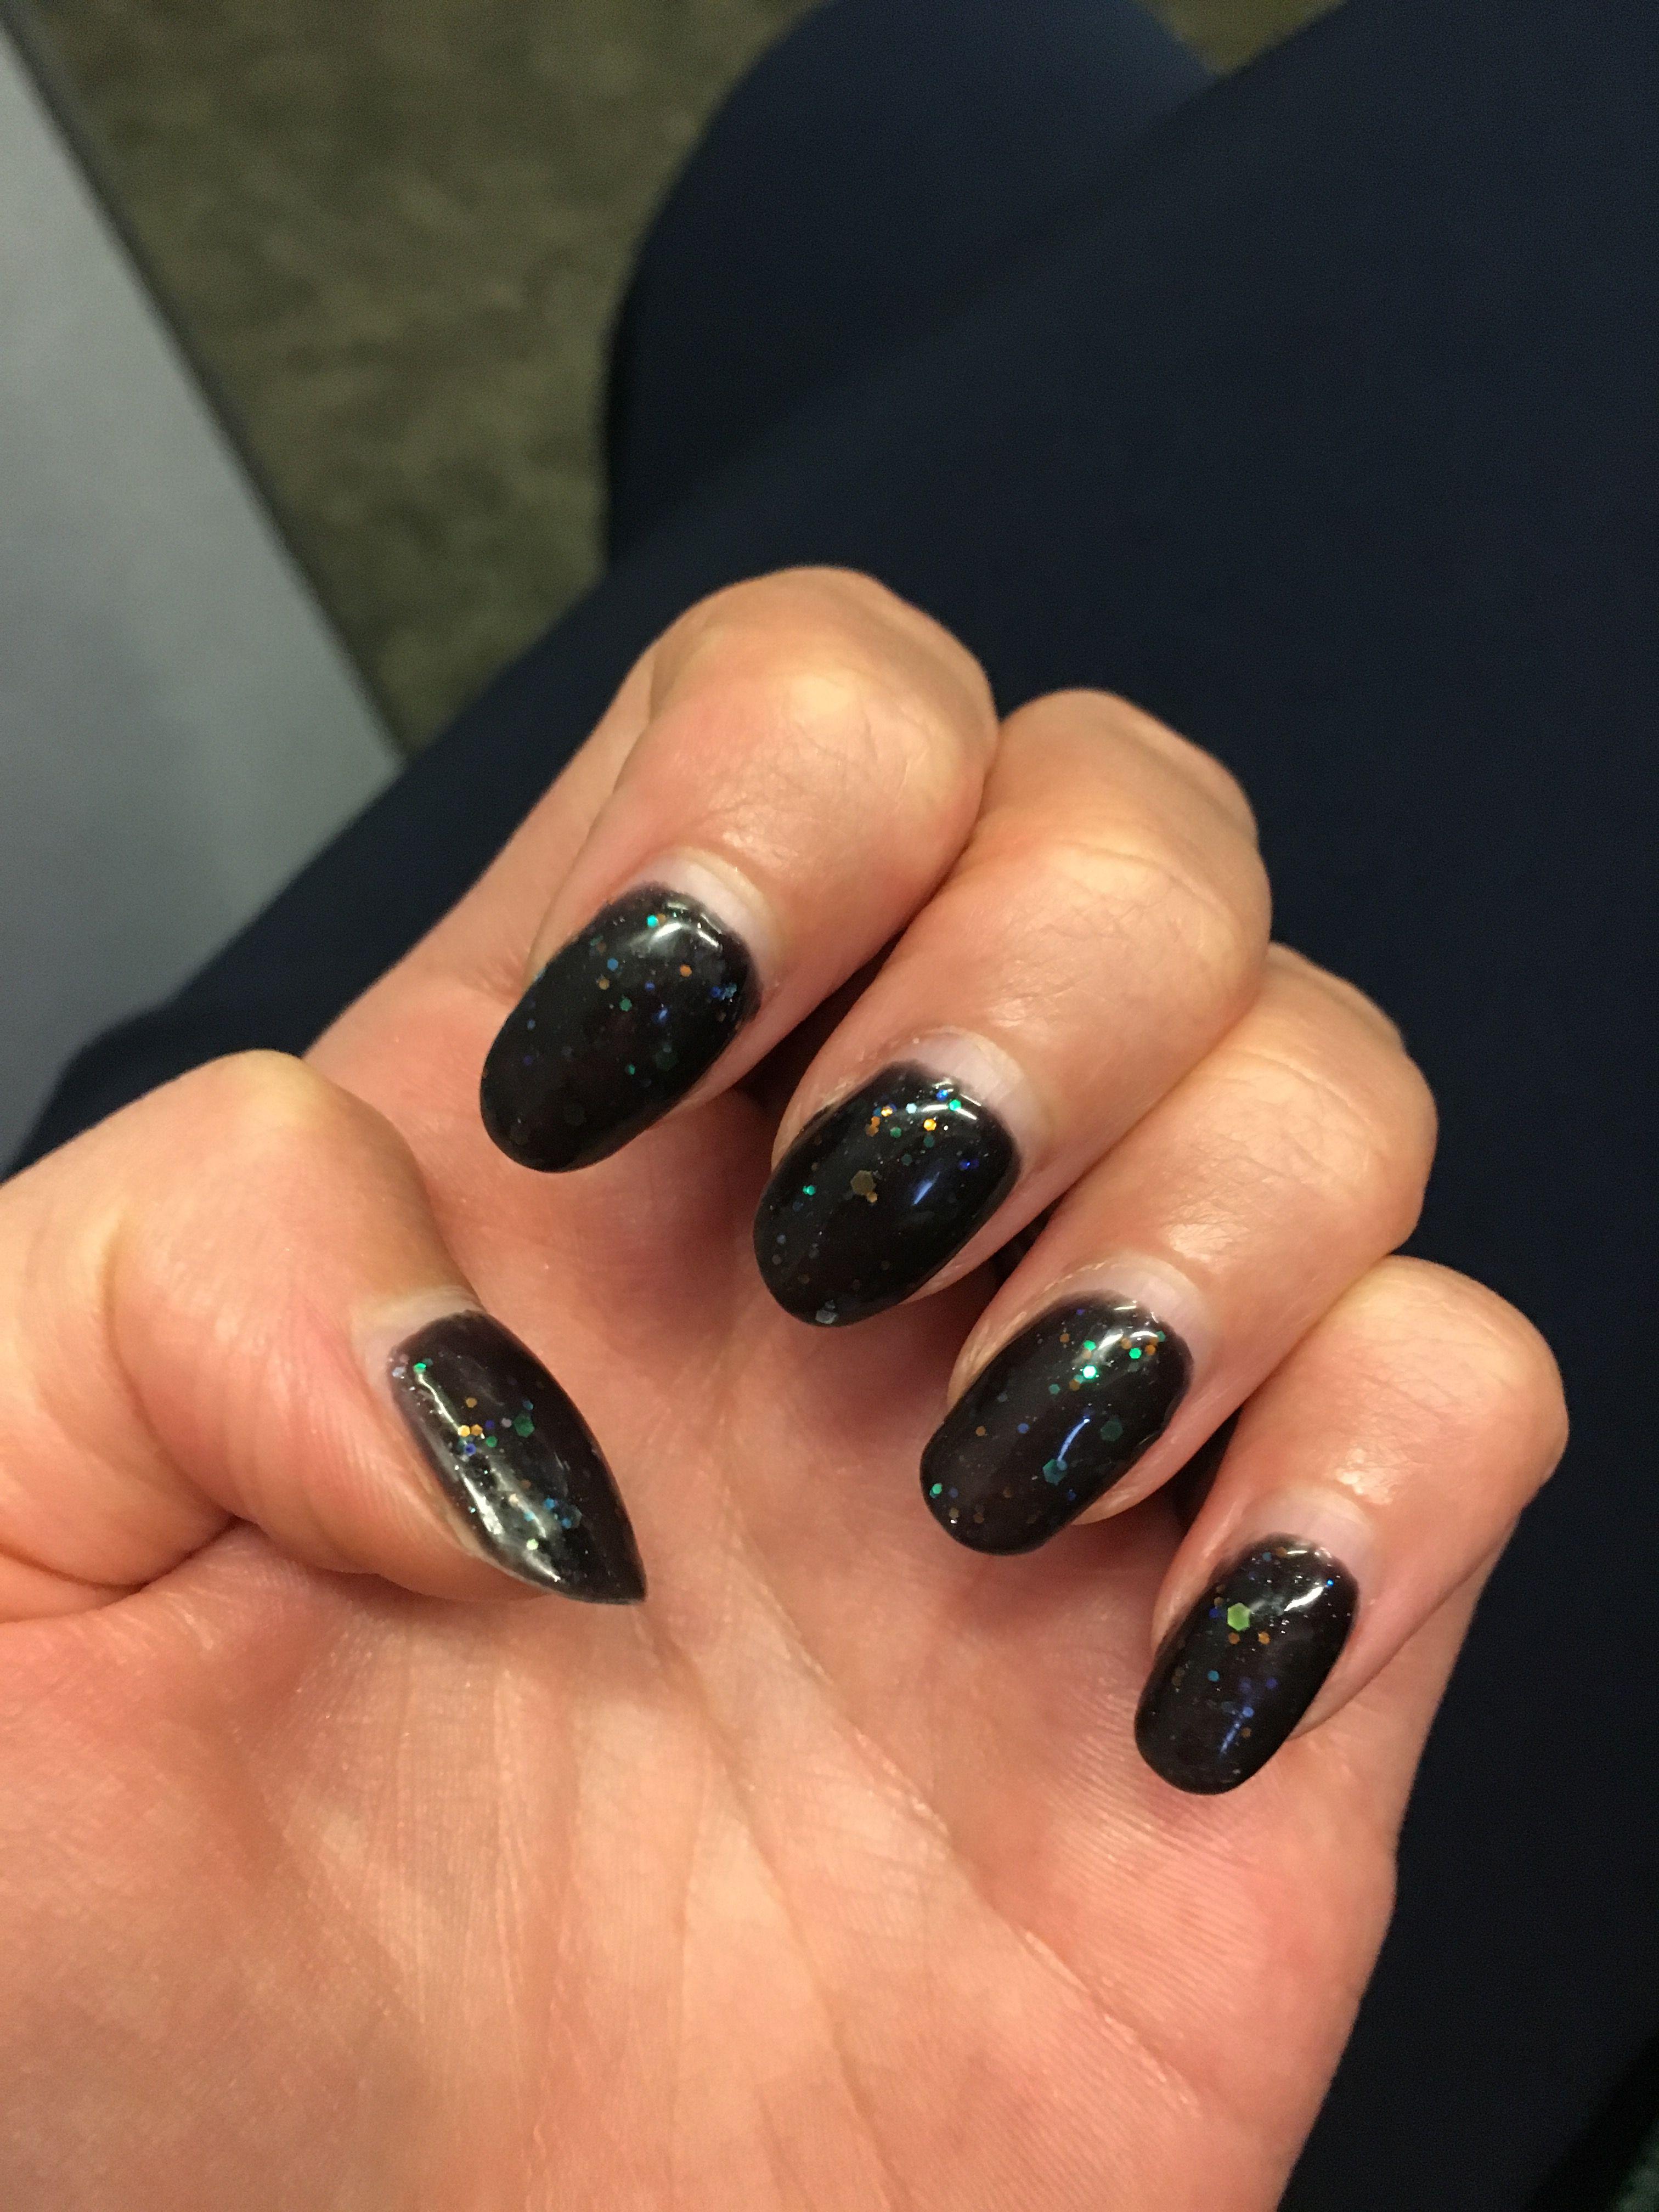 Bluesky black diamond glitter gel after 11 days | Shellac nails ...